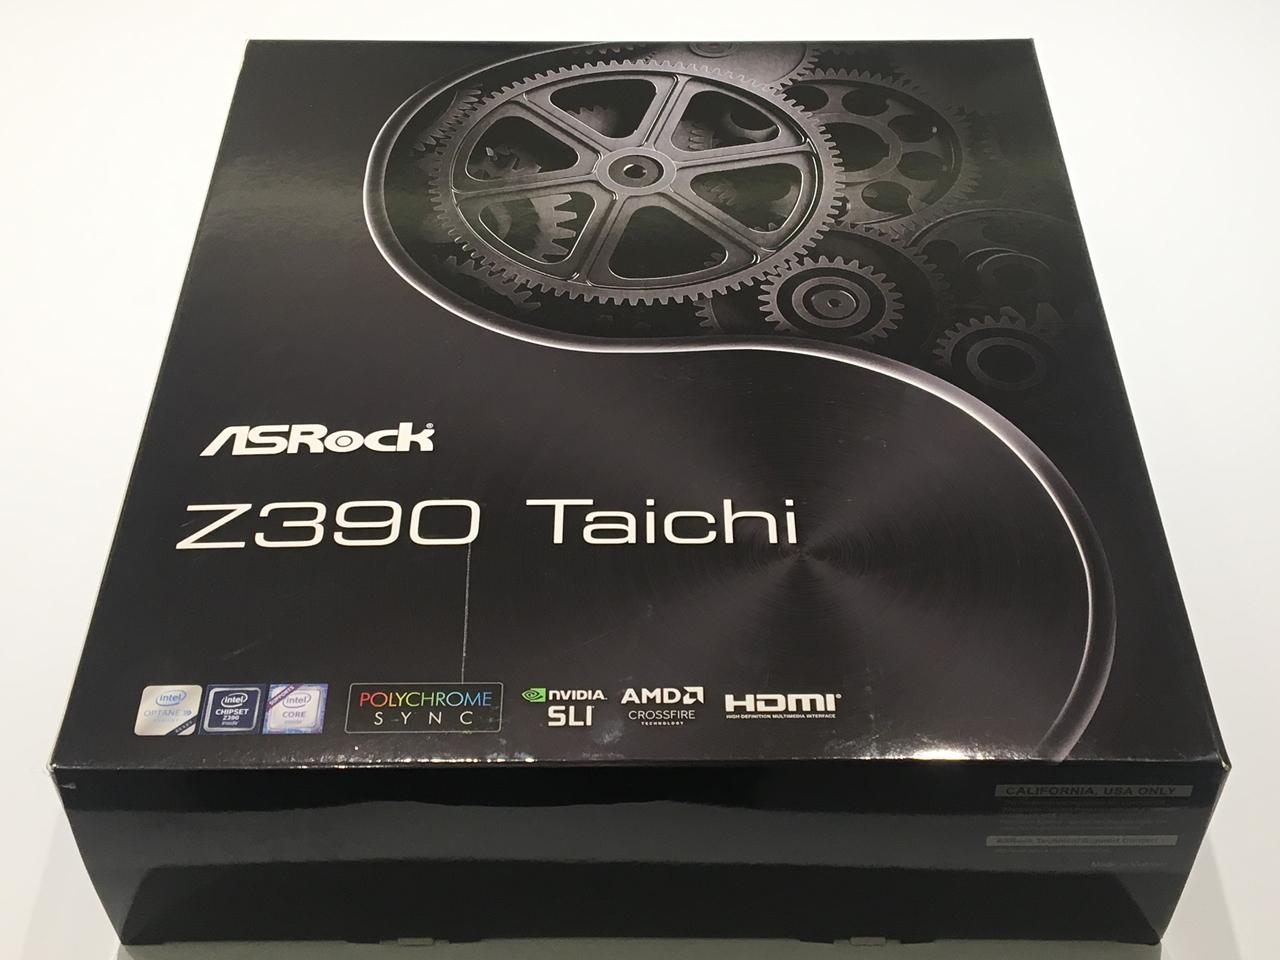 ASRock Z390 Taichi Motherboard Review - FunkyKit